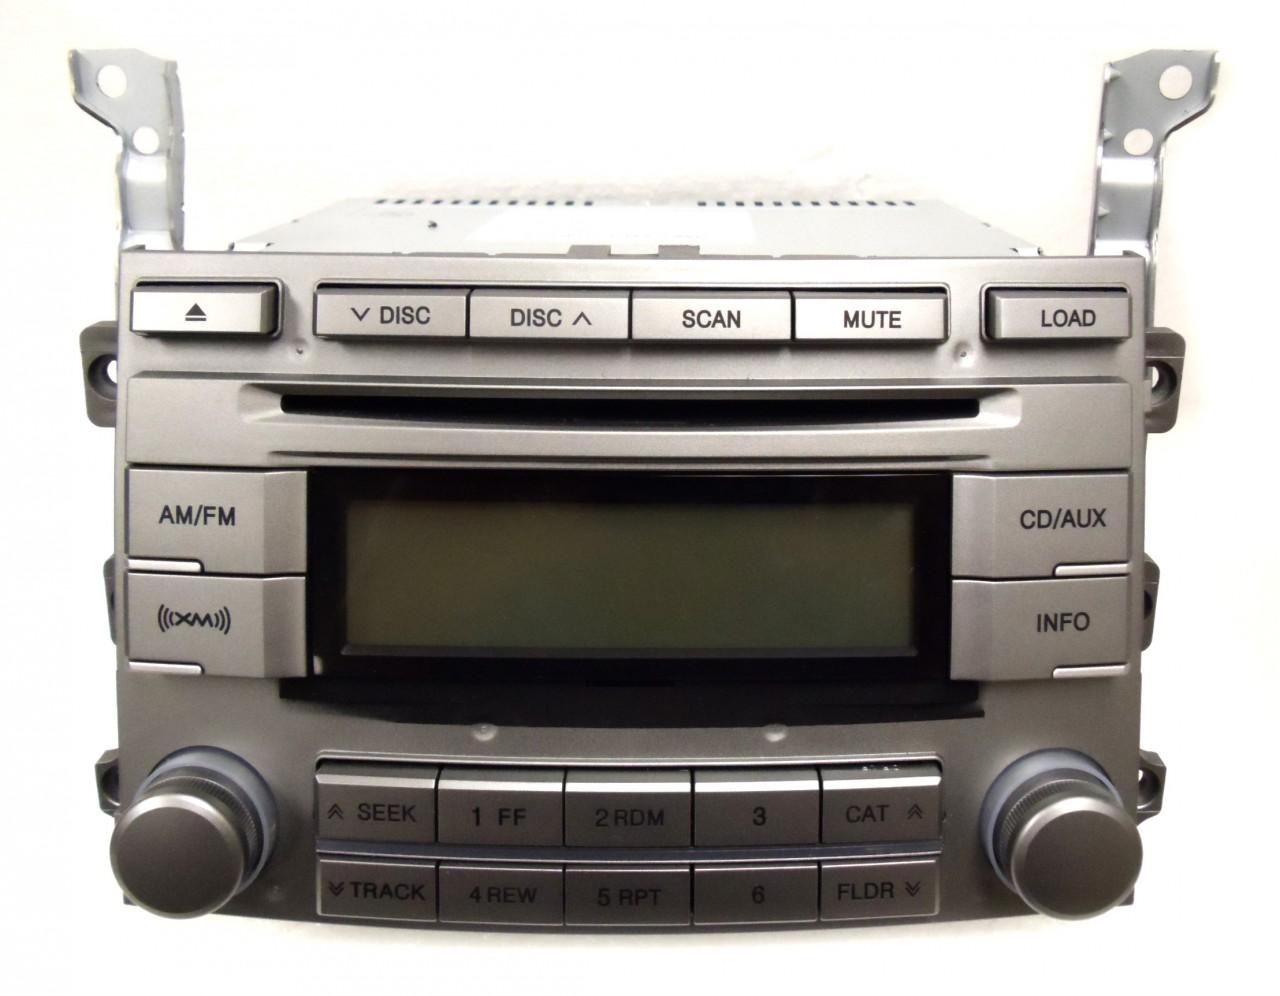 HYUNDAI Veracruz XM Satellite Radio Stereo 6 Disc Changer ...